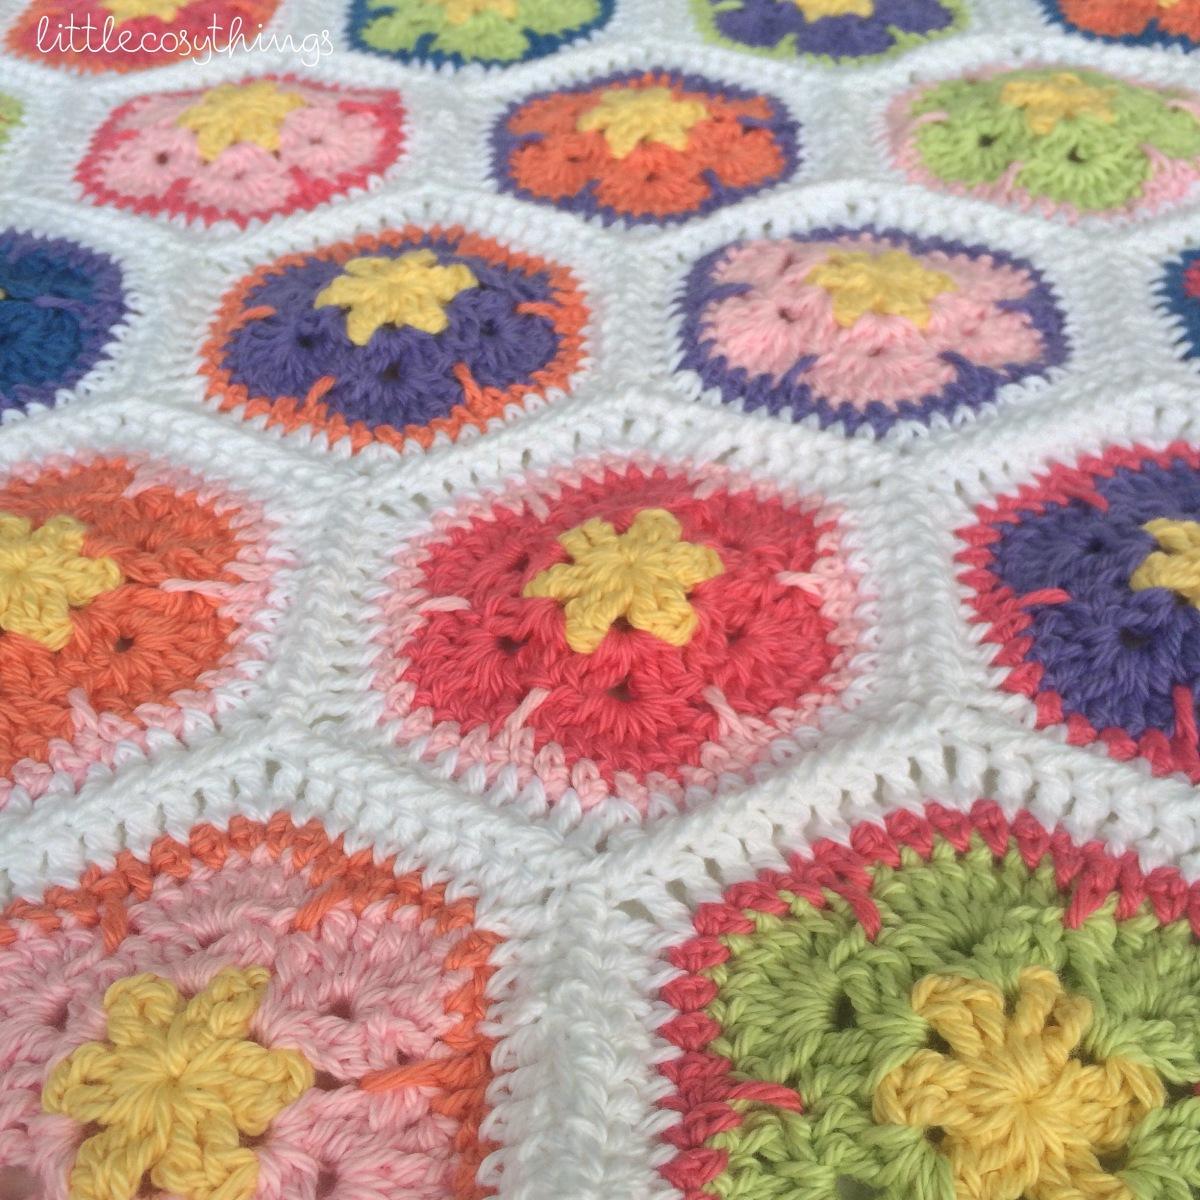 African Flower Crochet Dragon Pattern : An African Flower Crochet Blanket? Part ONE Little Cosy ...